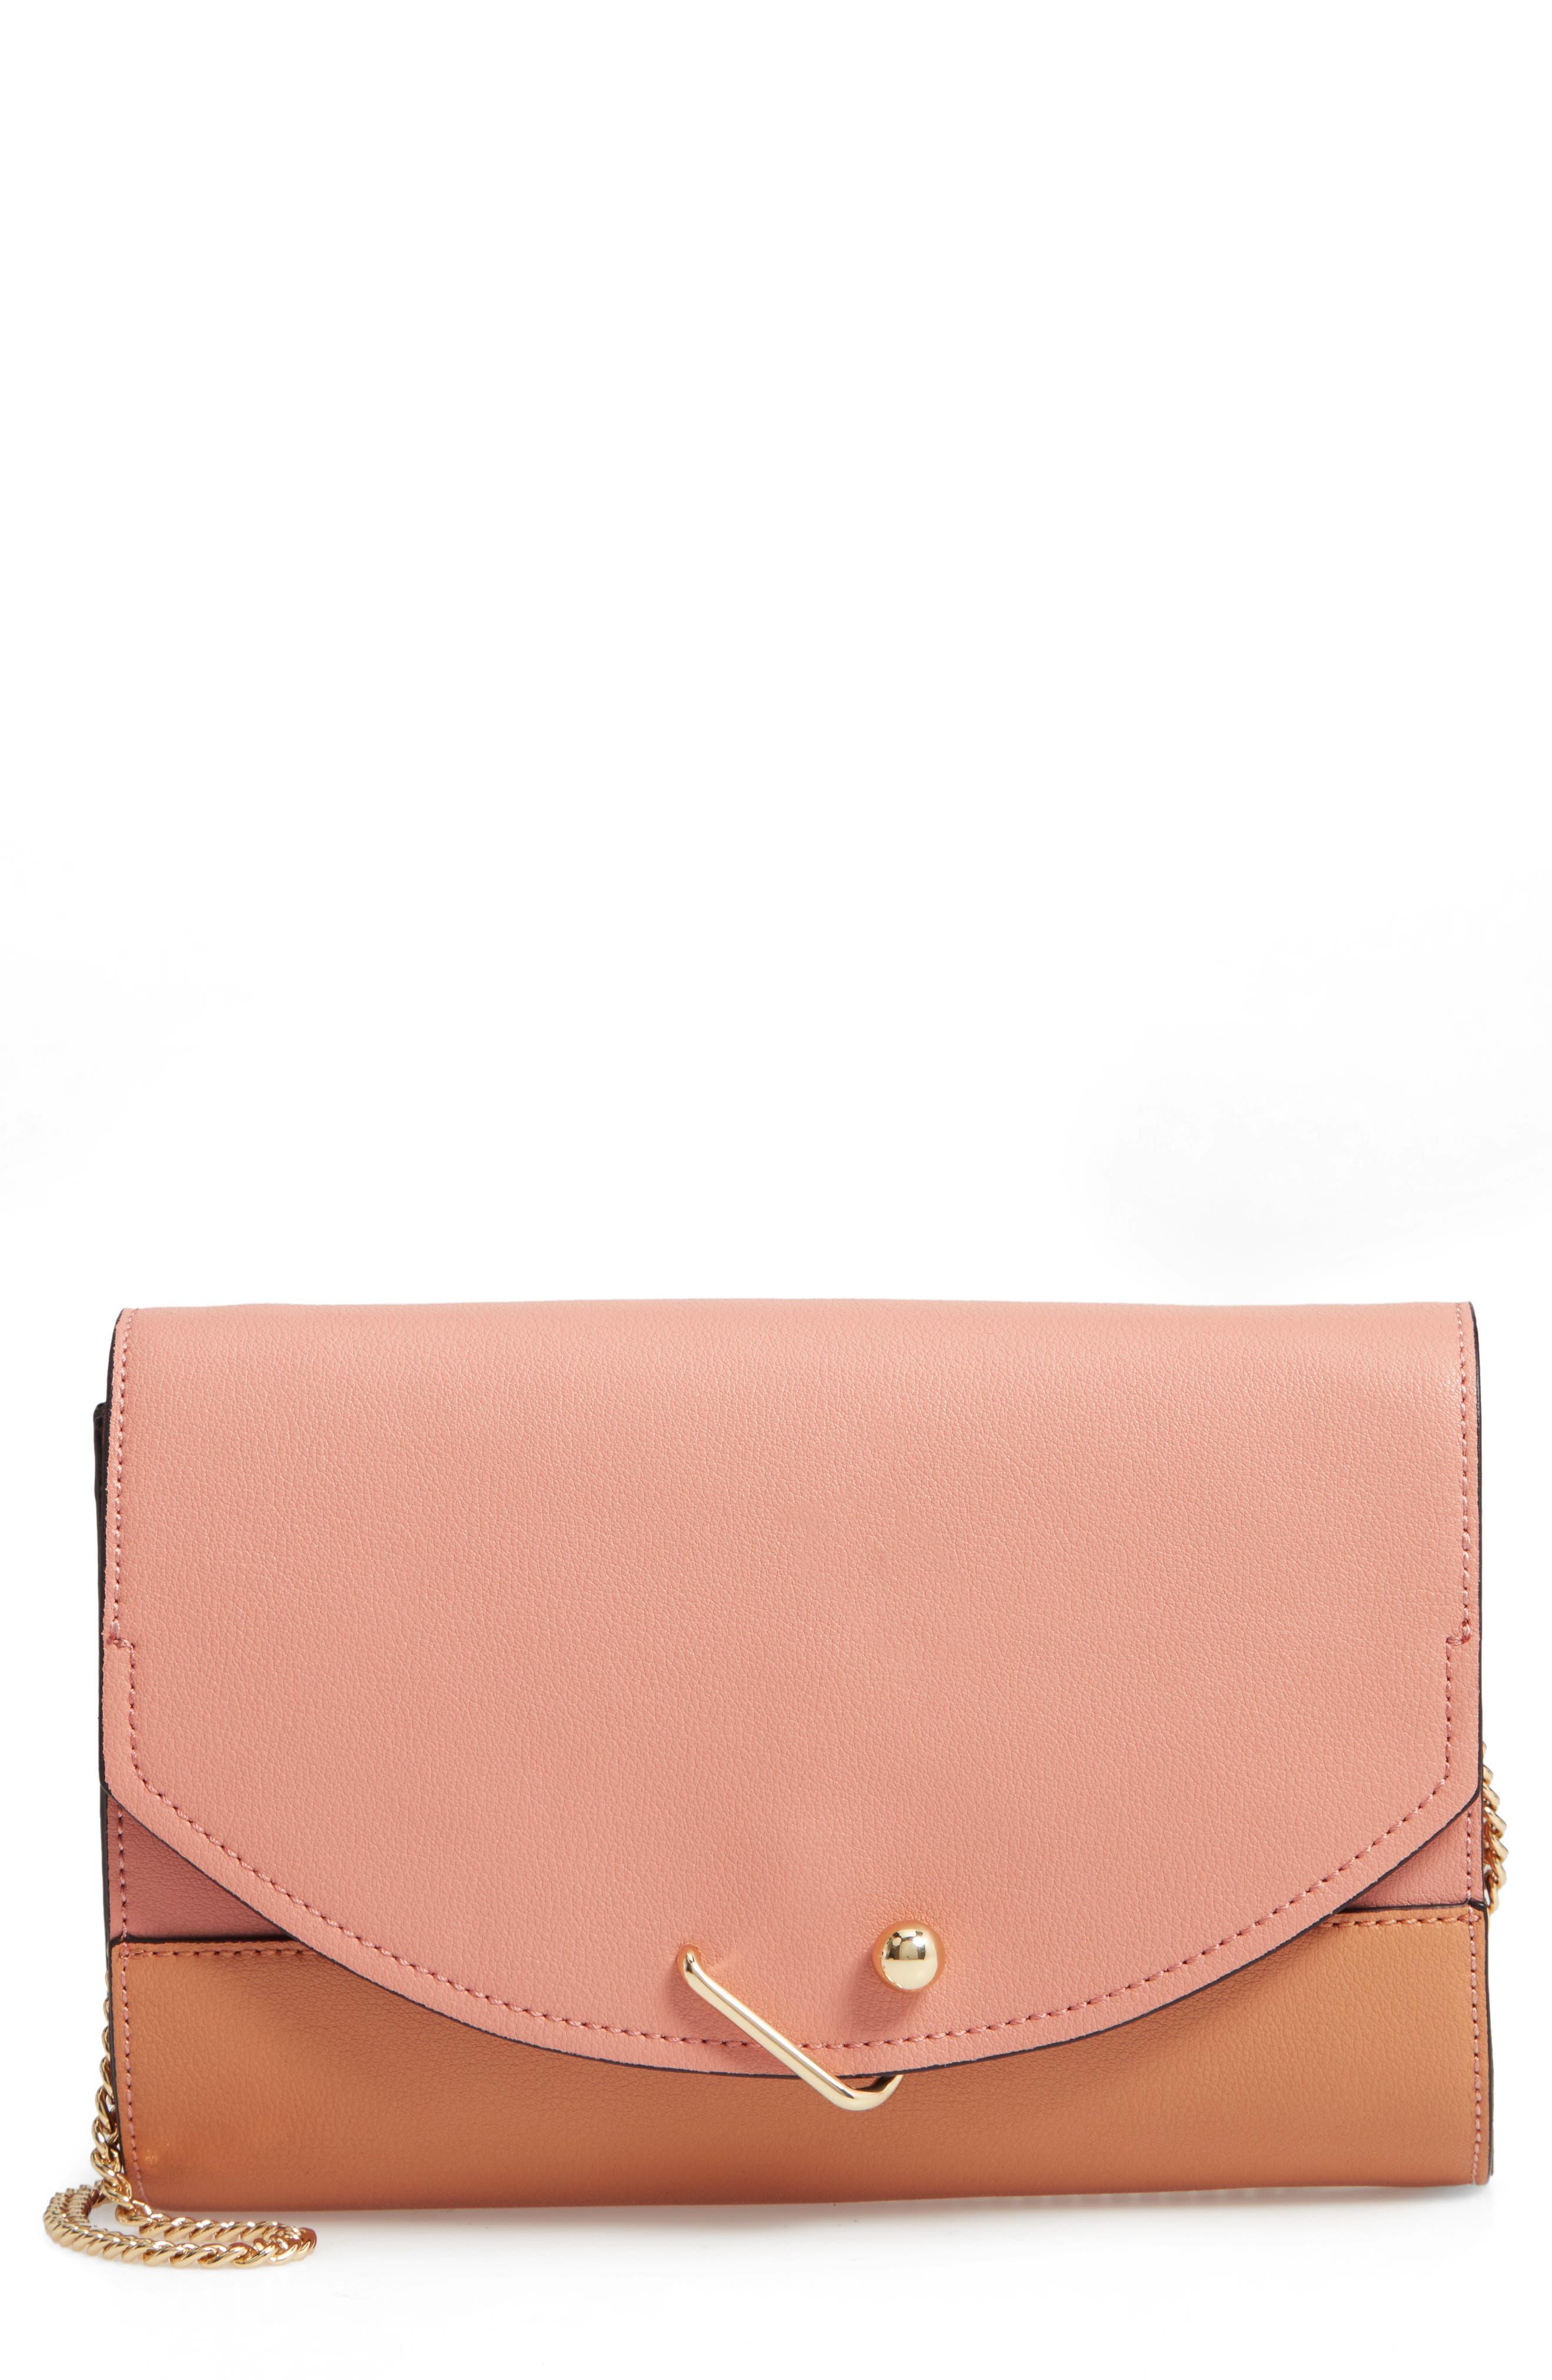 Easton Colorblock Leather Clutch,                         Main,                         color, BLUSH COMBO